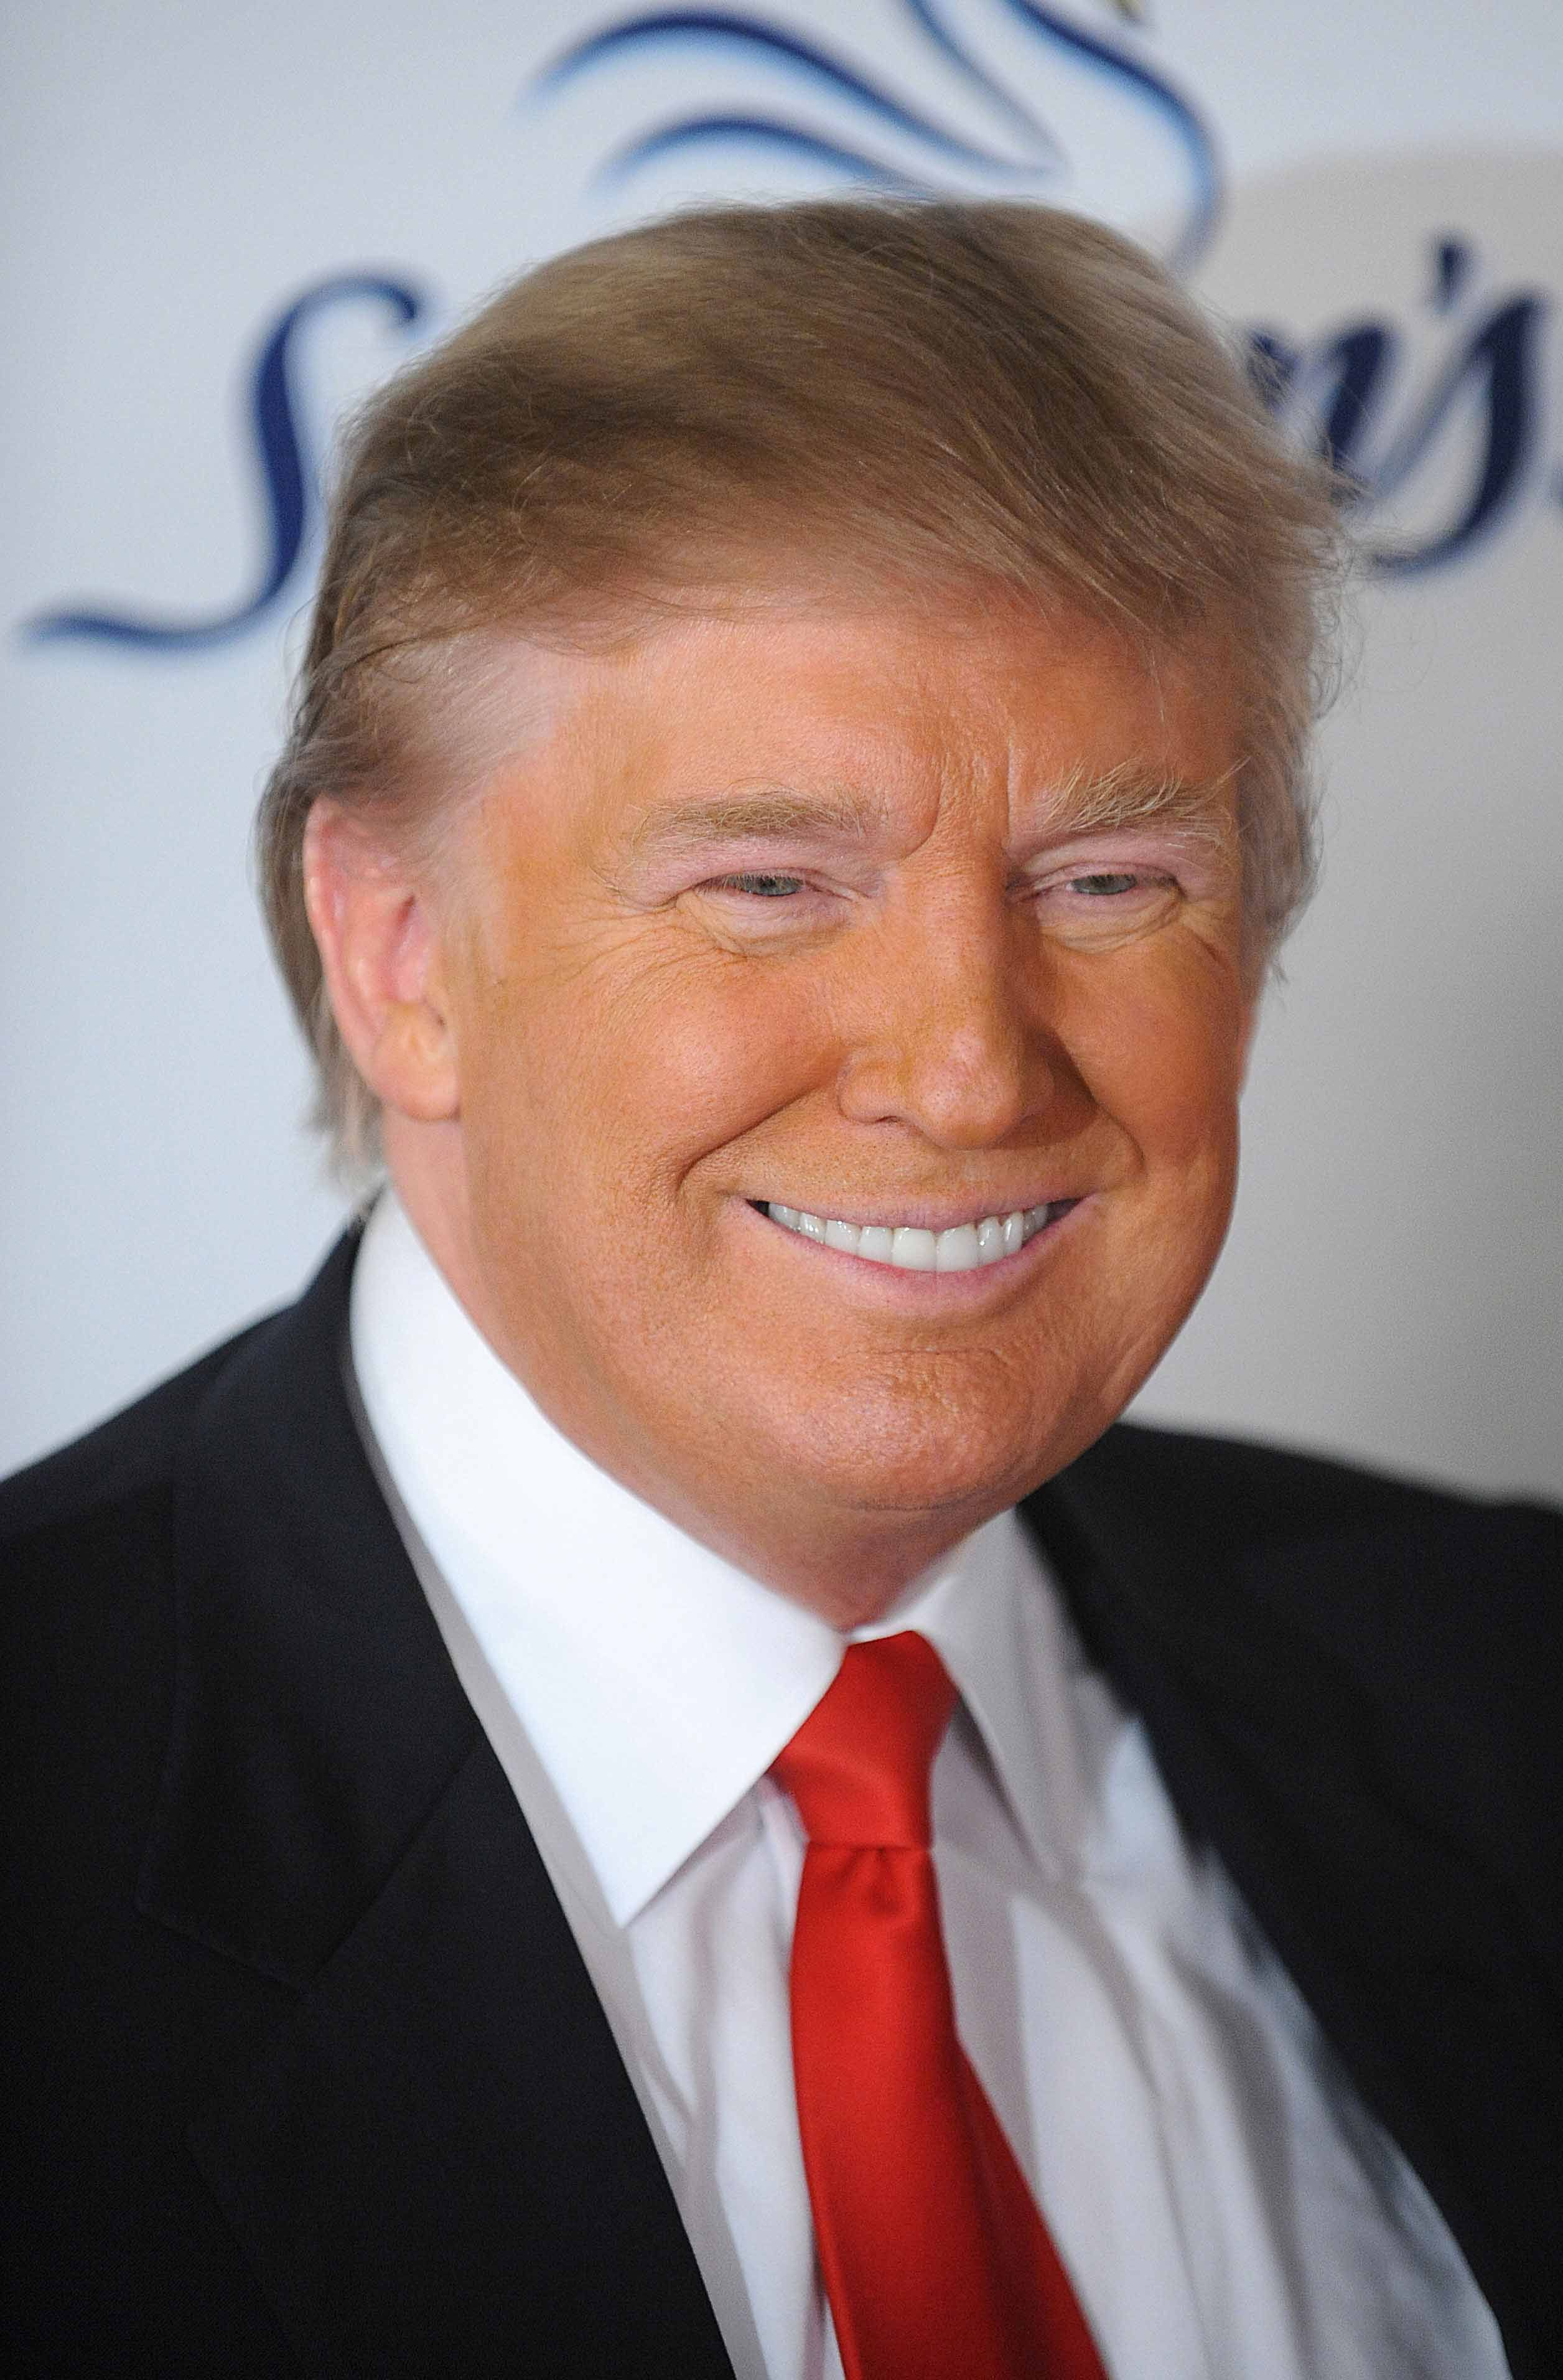 Donald Trump Wallpaper Hd Celebrities Hd Wallpapers